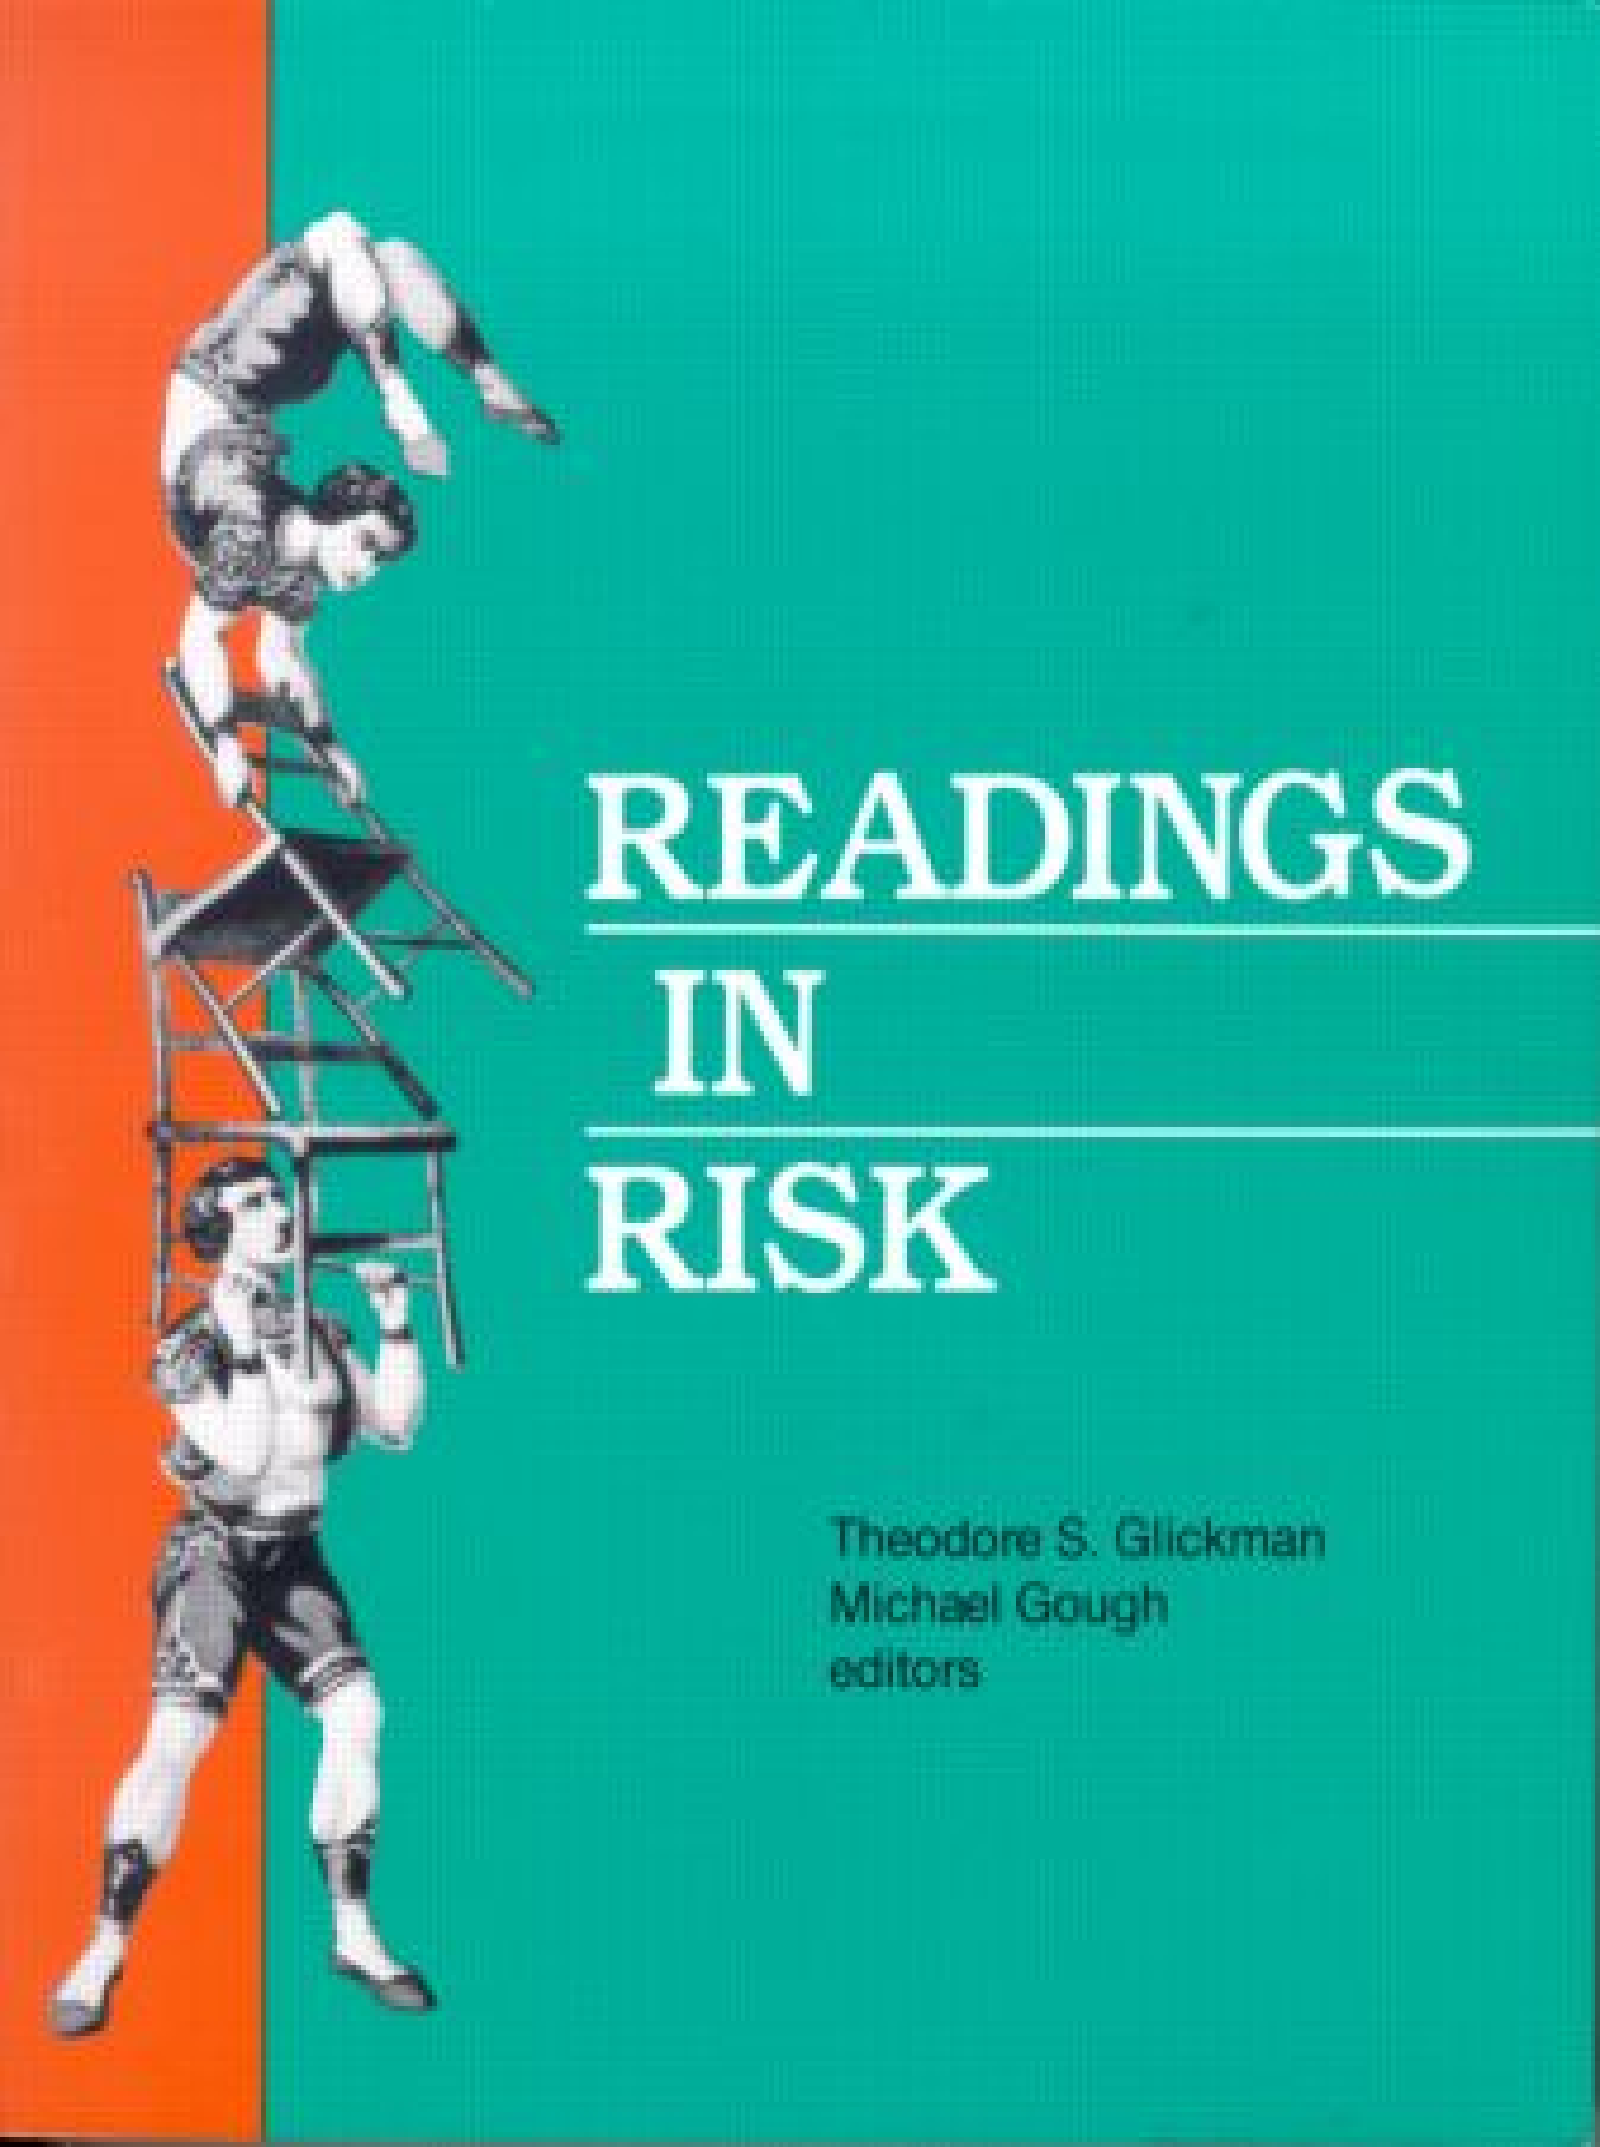 Readings in Risk (Paperback) book cover